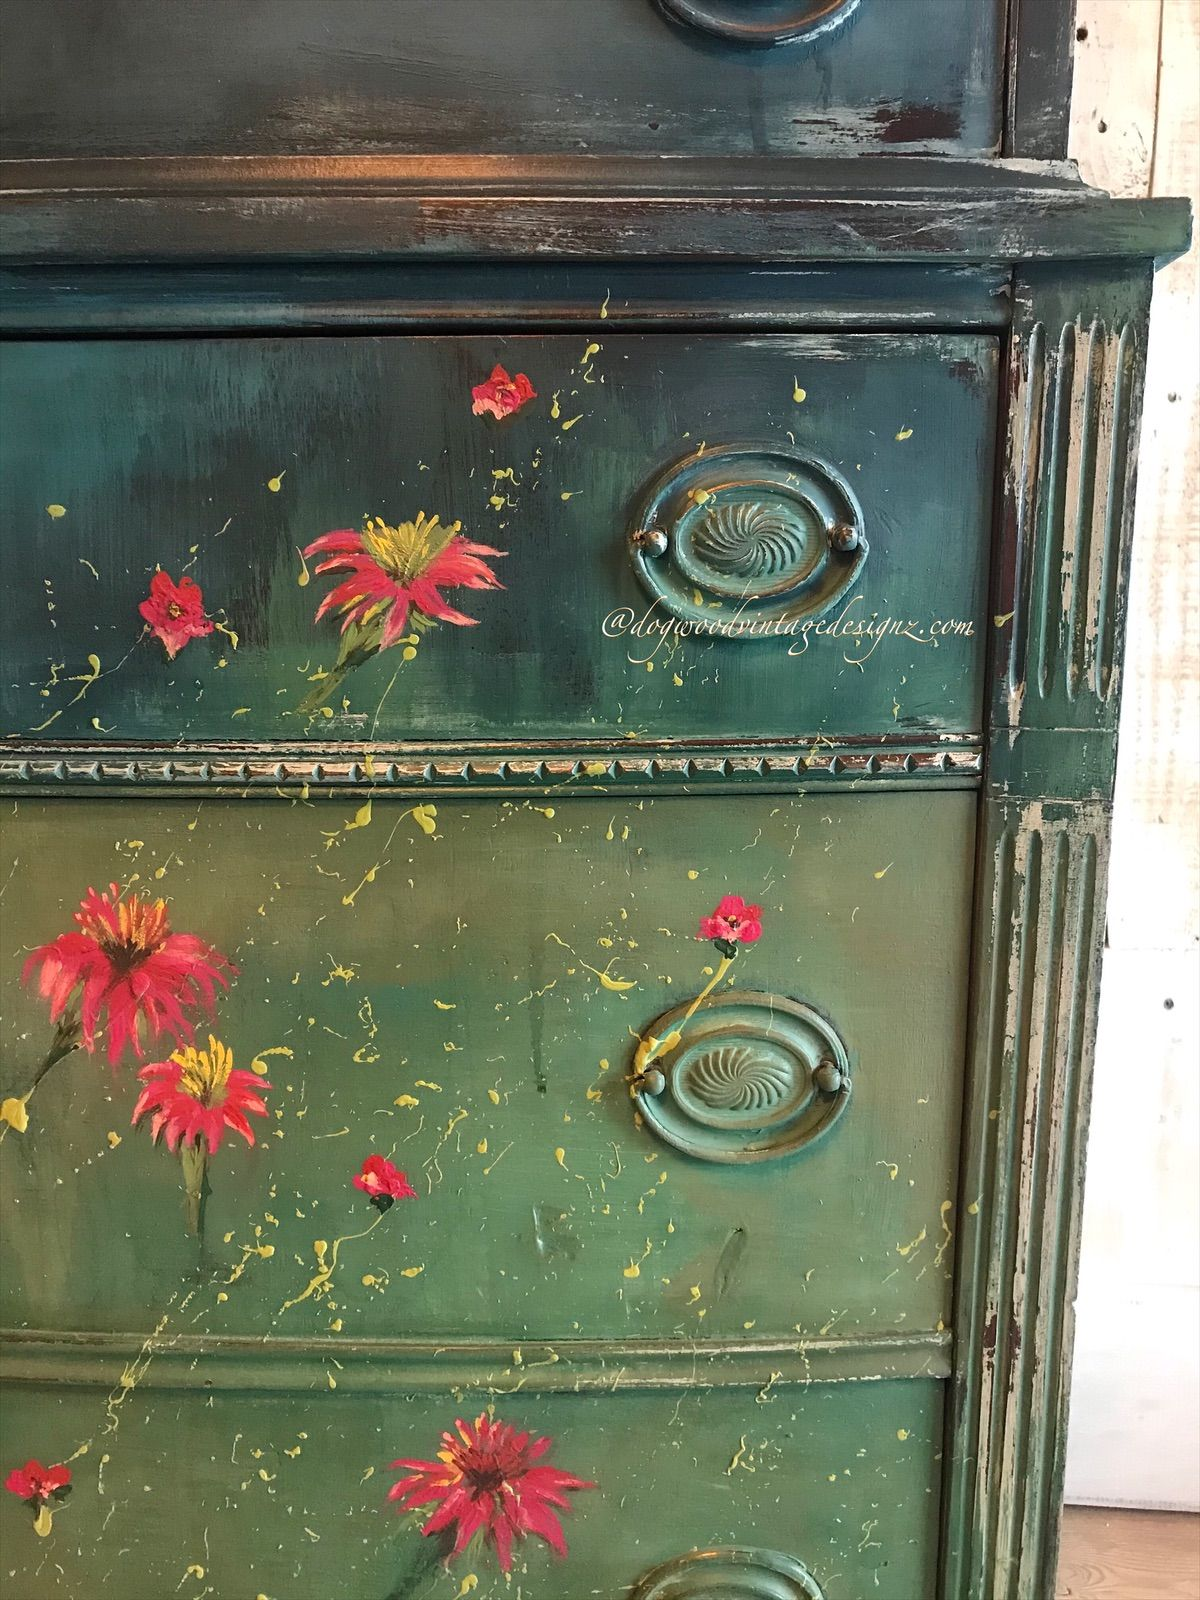 #furnitureartist #paintedfurniture #eclectic #boho #diypaint #debisdesigndiary #painteddresser #modernfarmhouse #anniesloan #chalkpaint #diyhomedecor #rusticelegance #vintagefurnitureflip